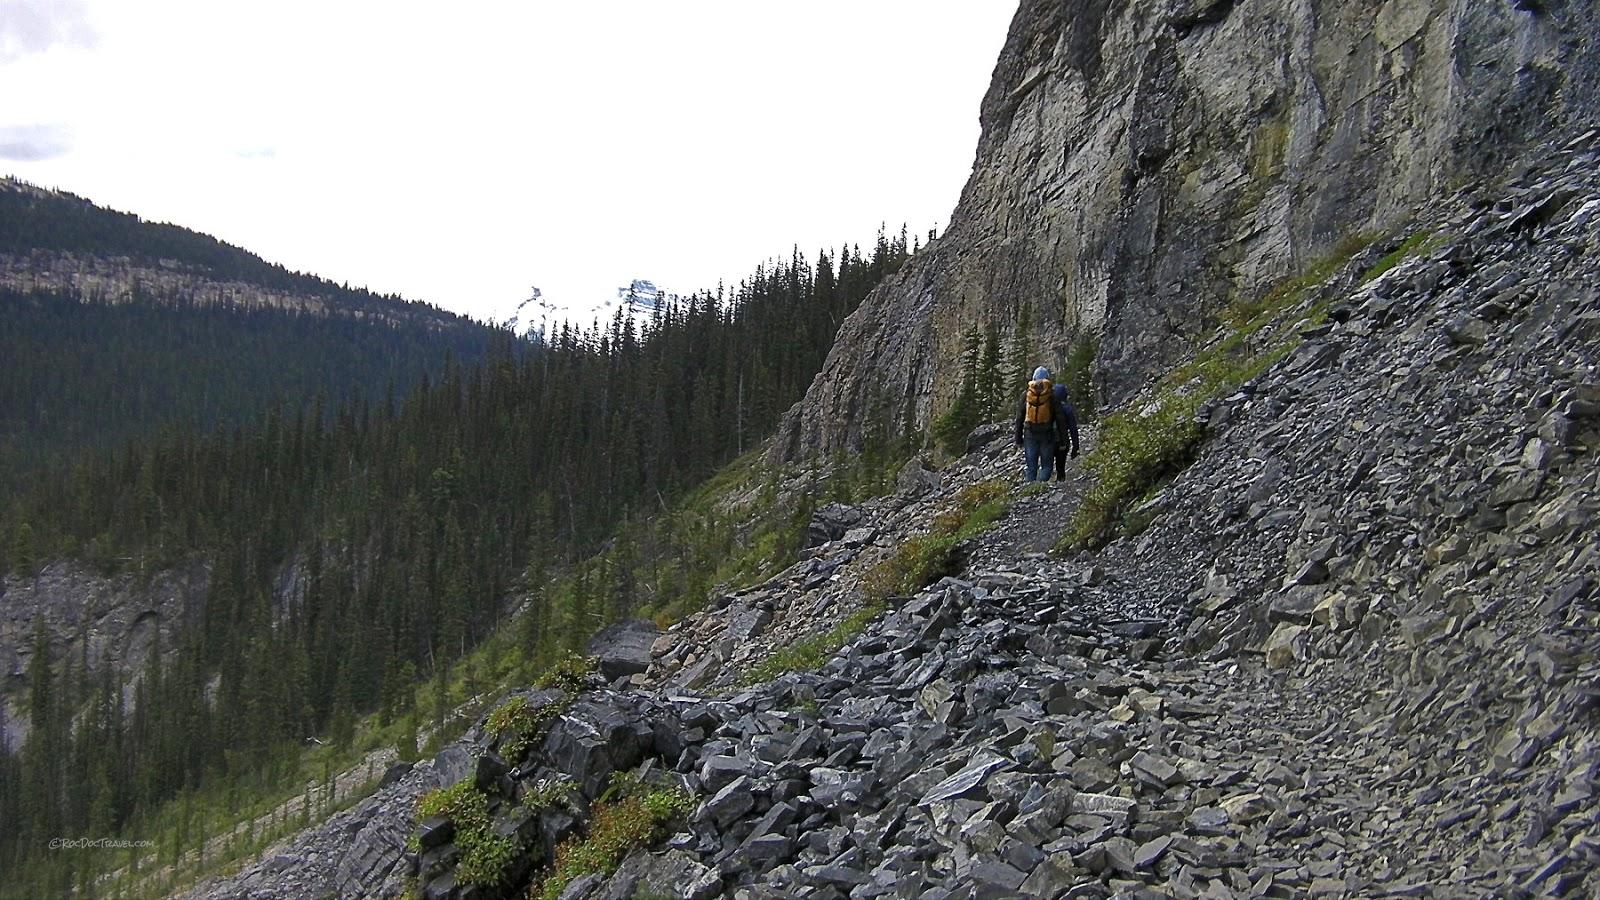 Burgess shale yoho national park british columbia canada geology travel trip fossils hike mountains rockies copyright rocdoctravel.com